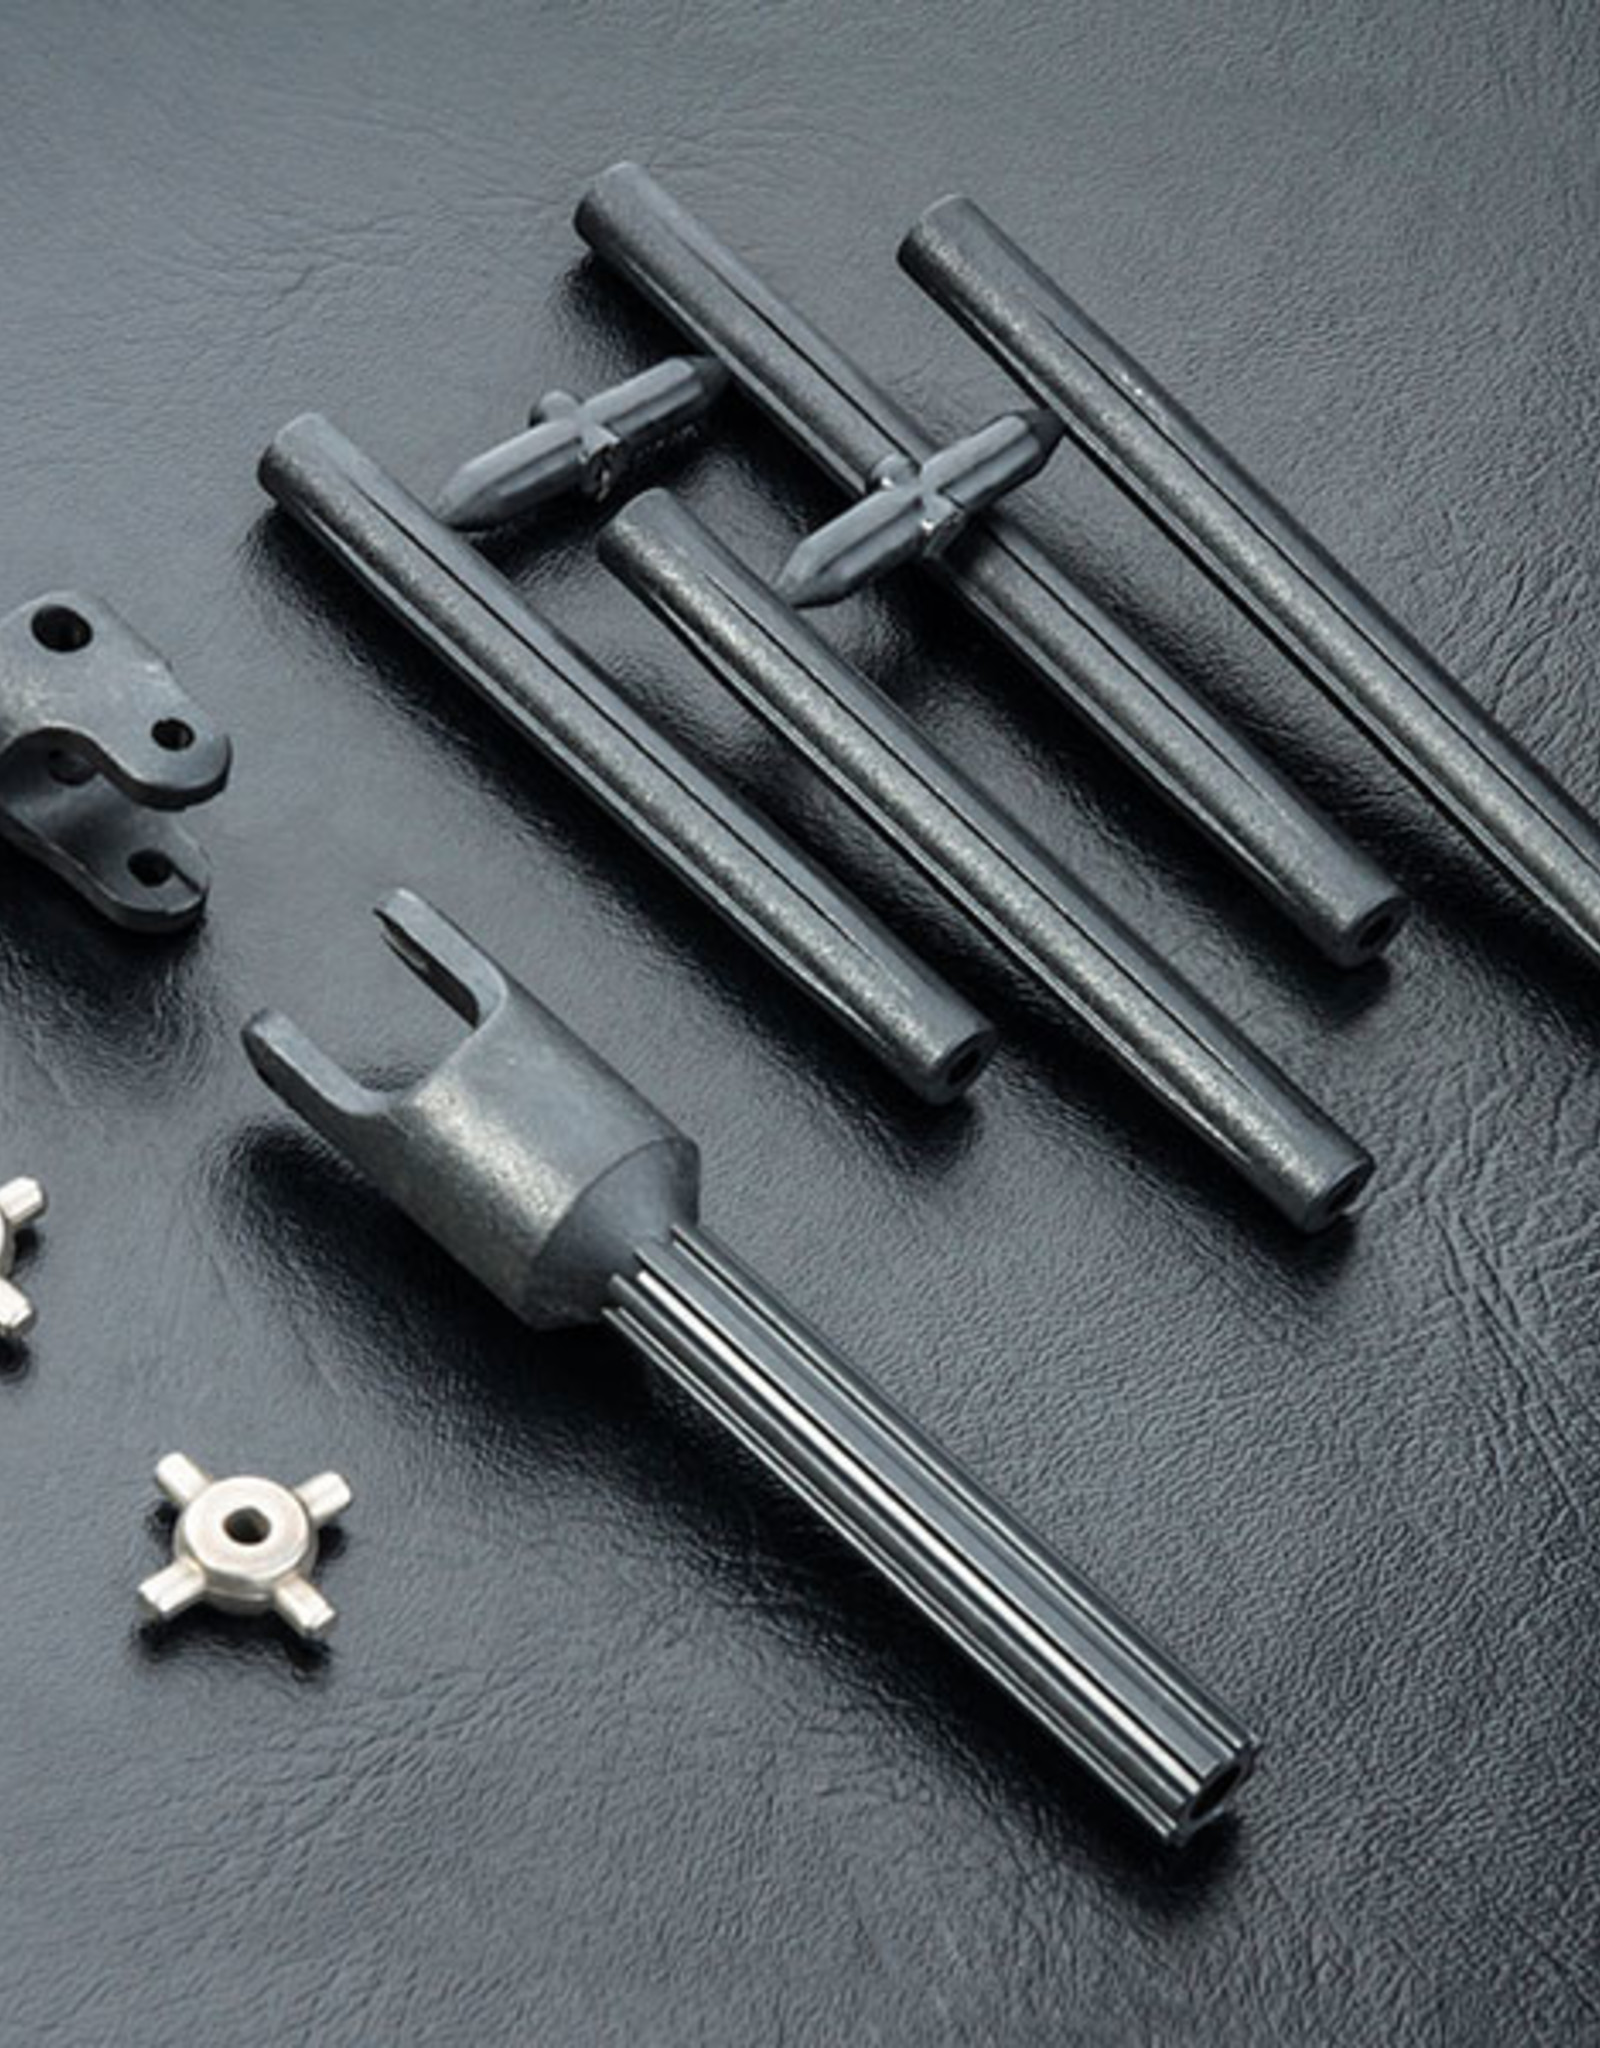 MST MXSPD230091 CMX Wheelbase 267mm accessories 230091 by MST